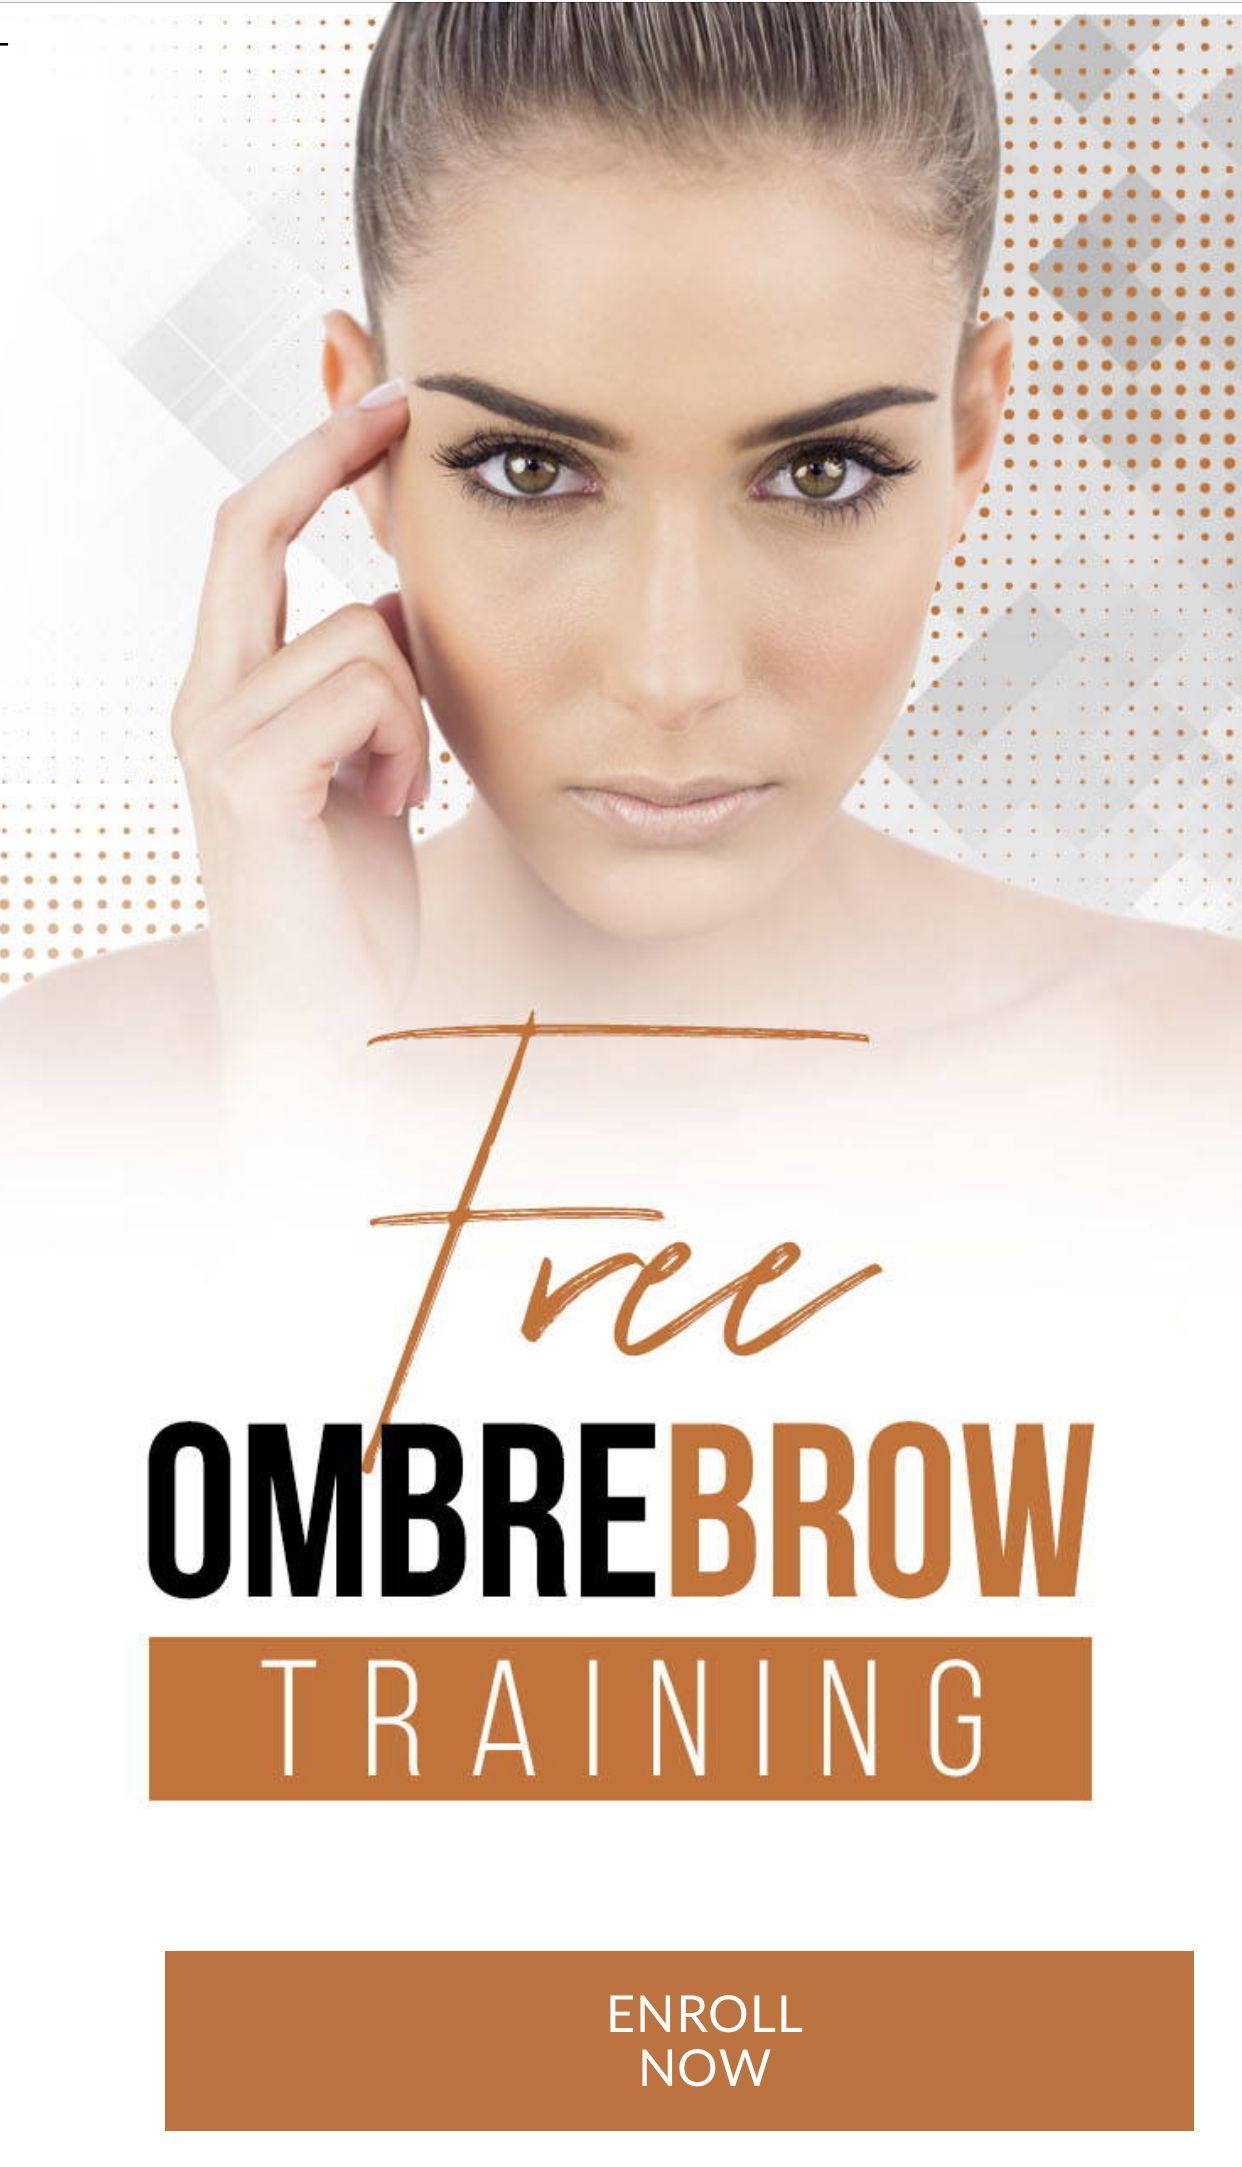 Ombré Brows in 2020 Brows, Ombre technique, Permanent makeup